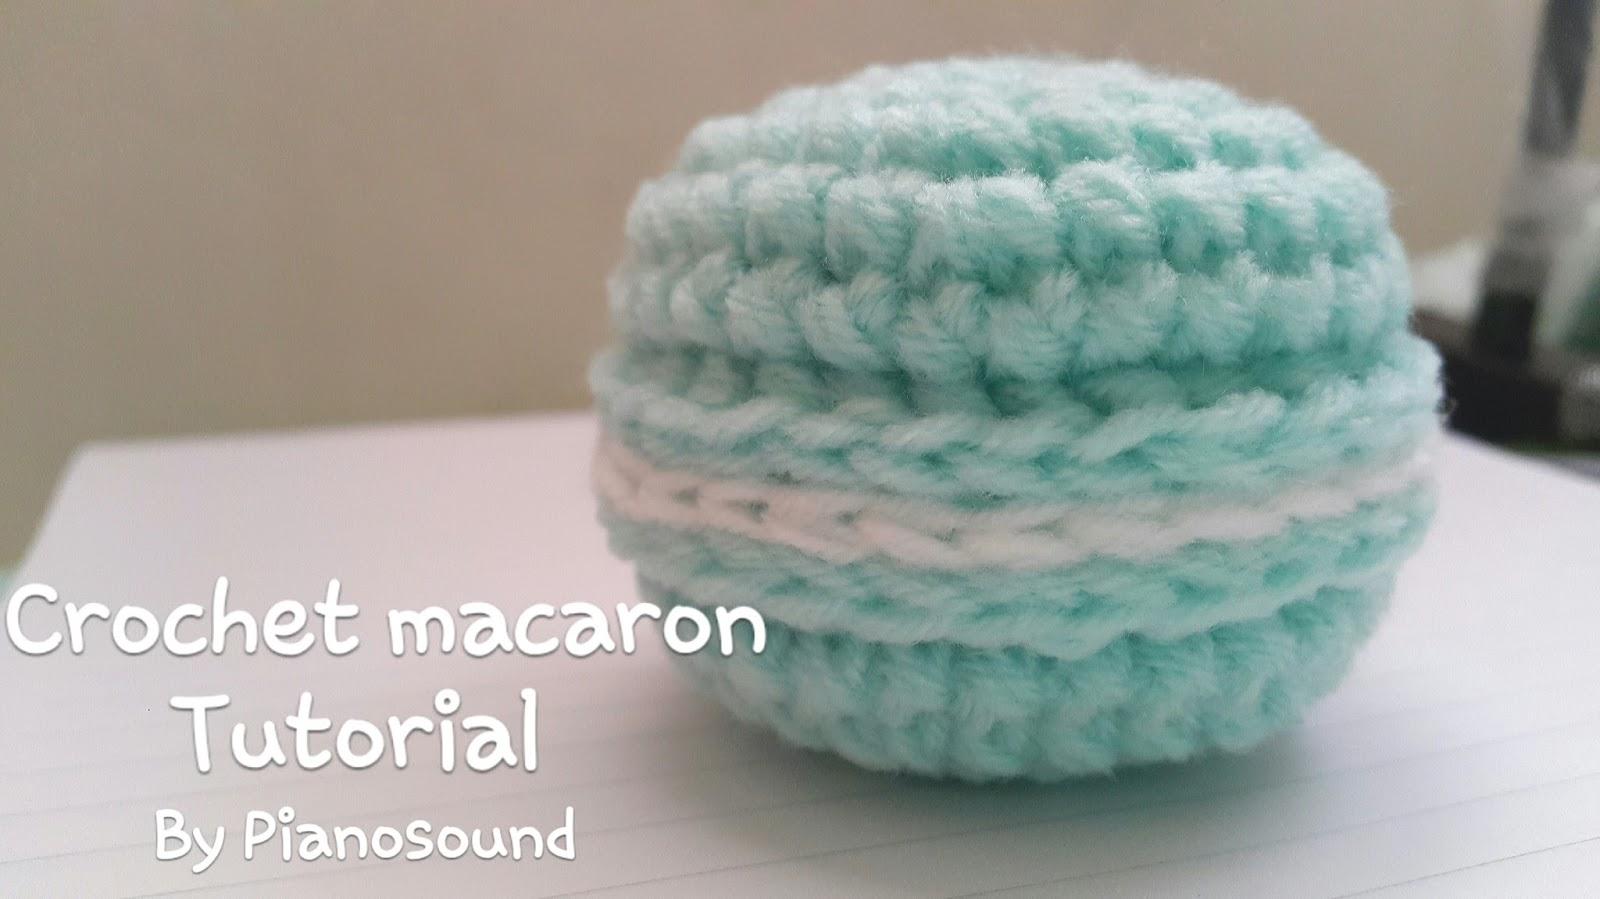 Amigurumi Food : Amigurumipianosound crochet free crochet amigurumi macaron